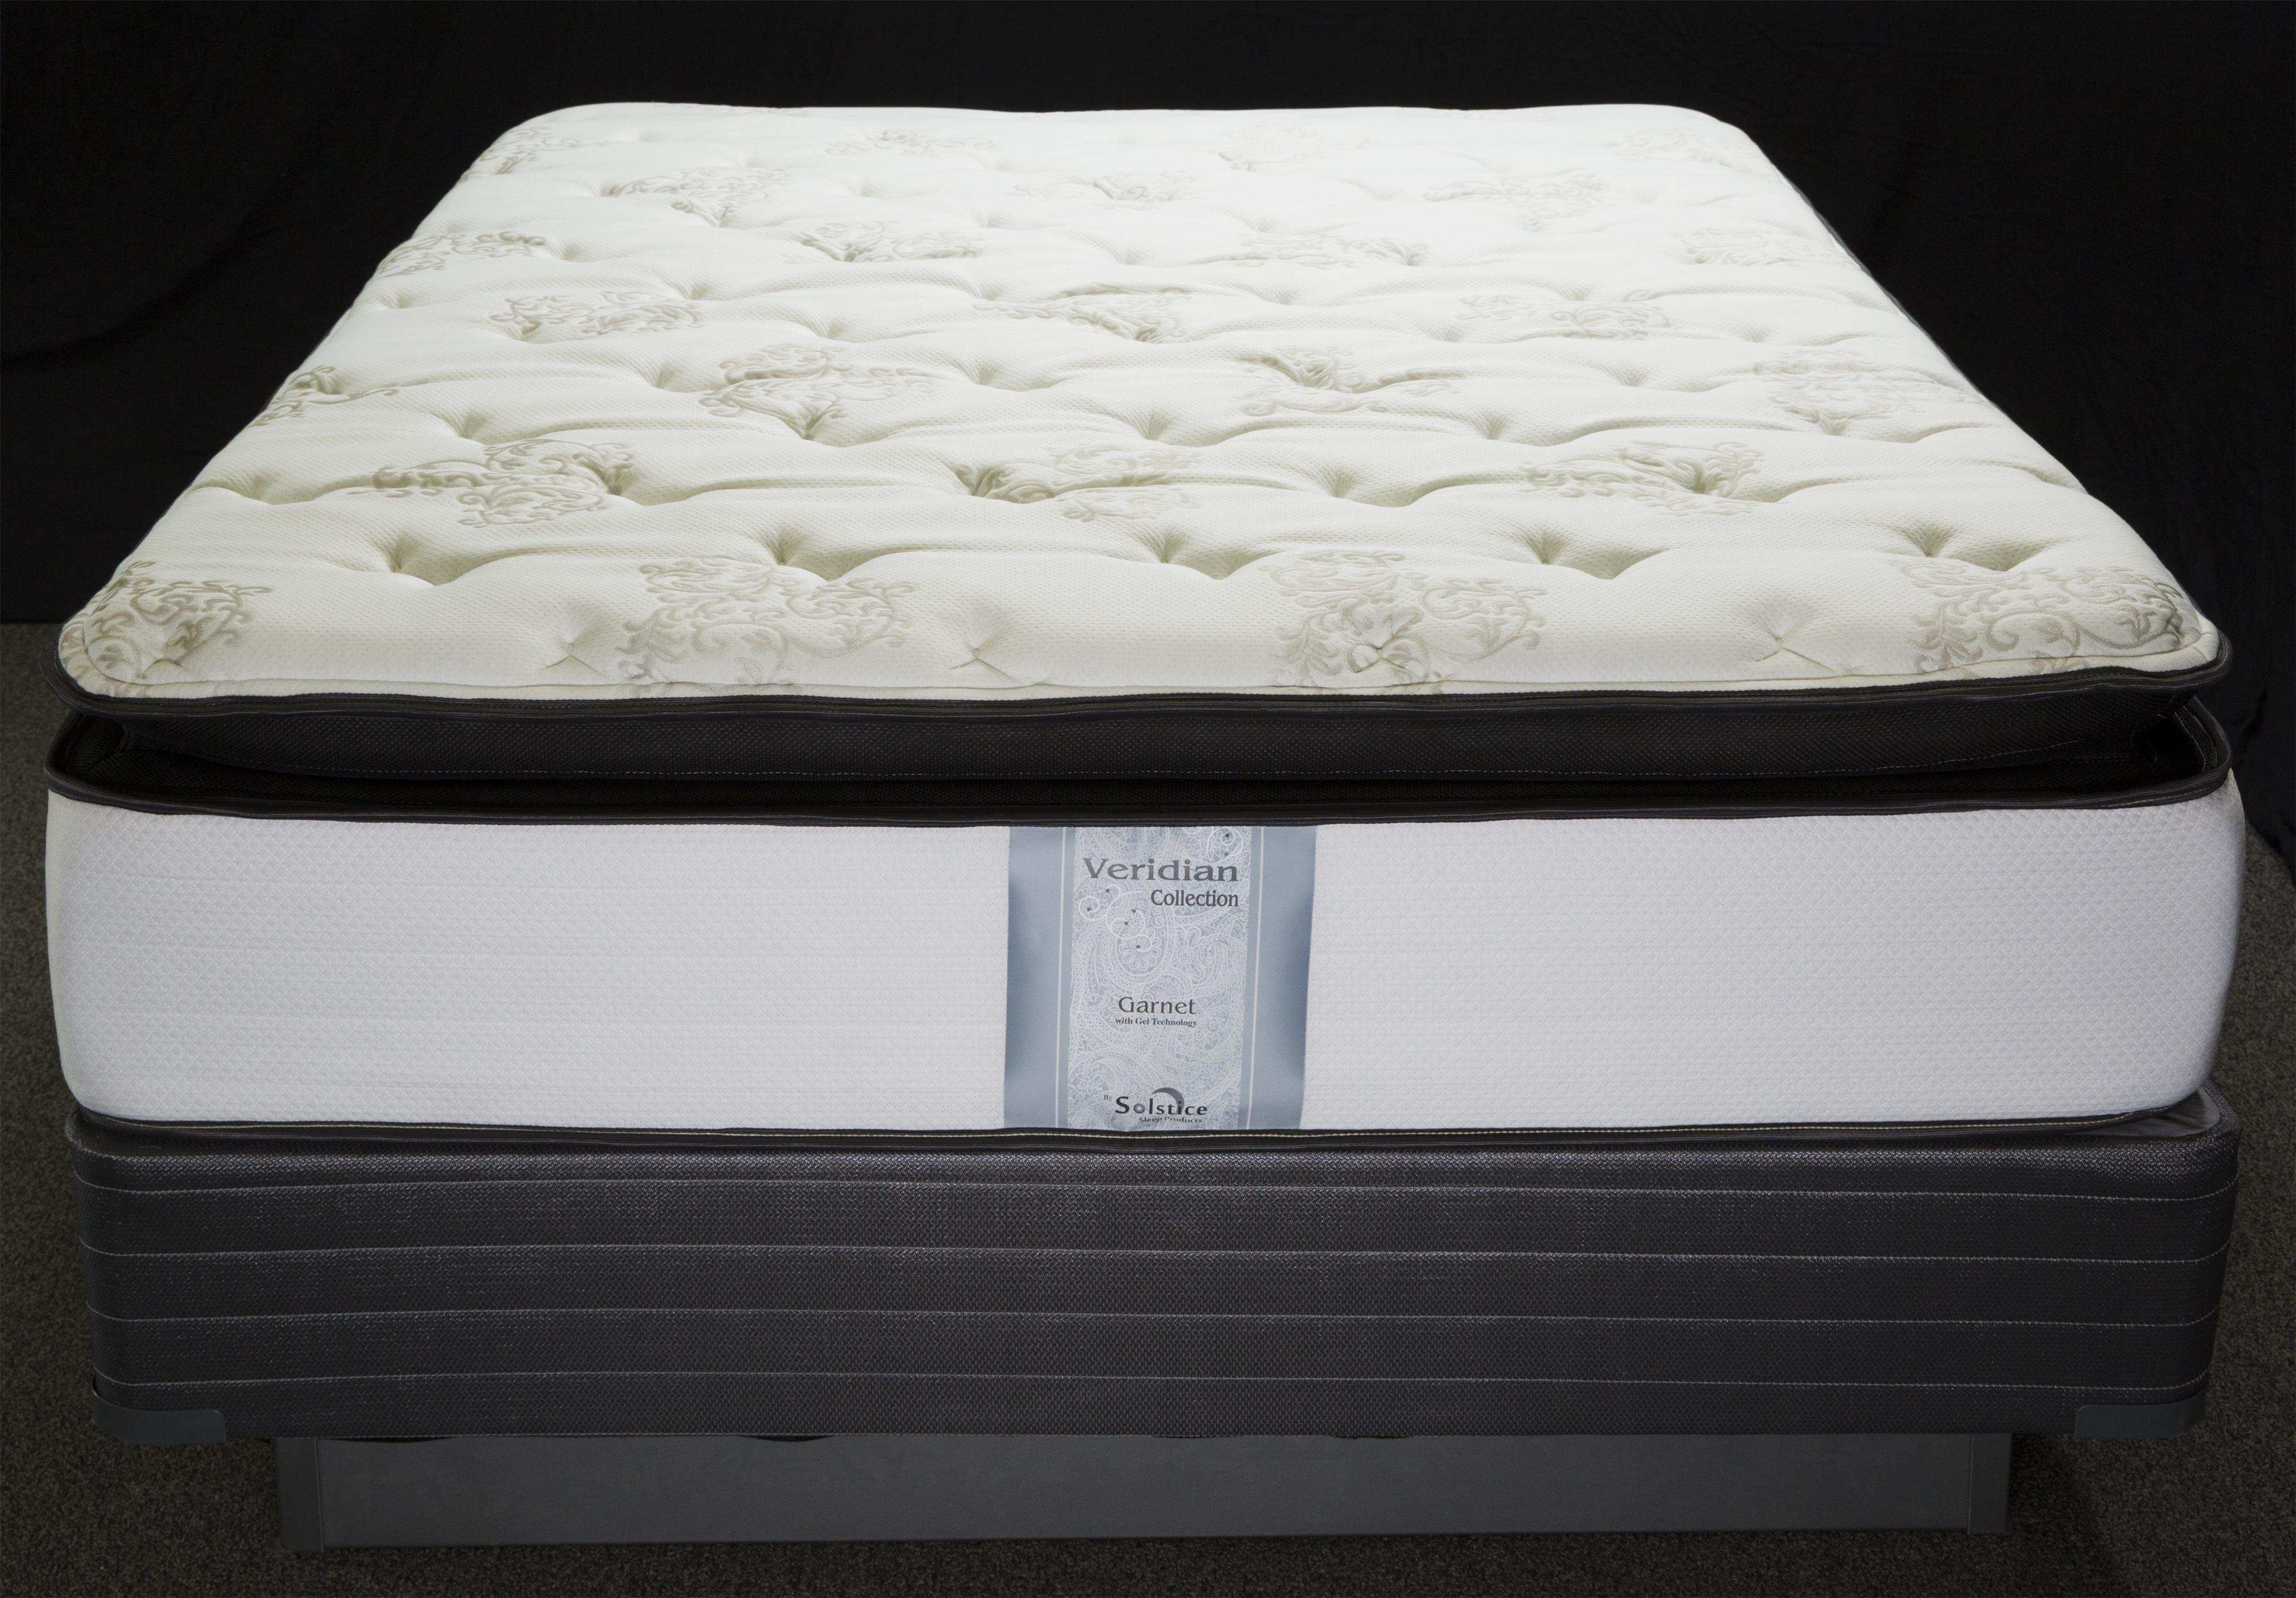 Veridian Garnet Queen Visco Pillow Top Mattress by Solstice Sleep Products at Virginia Furniture Market